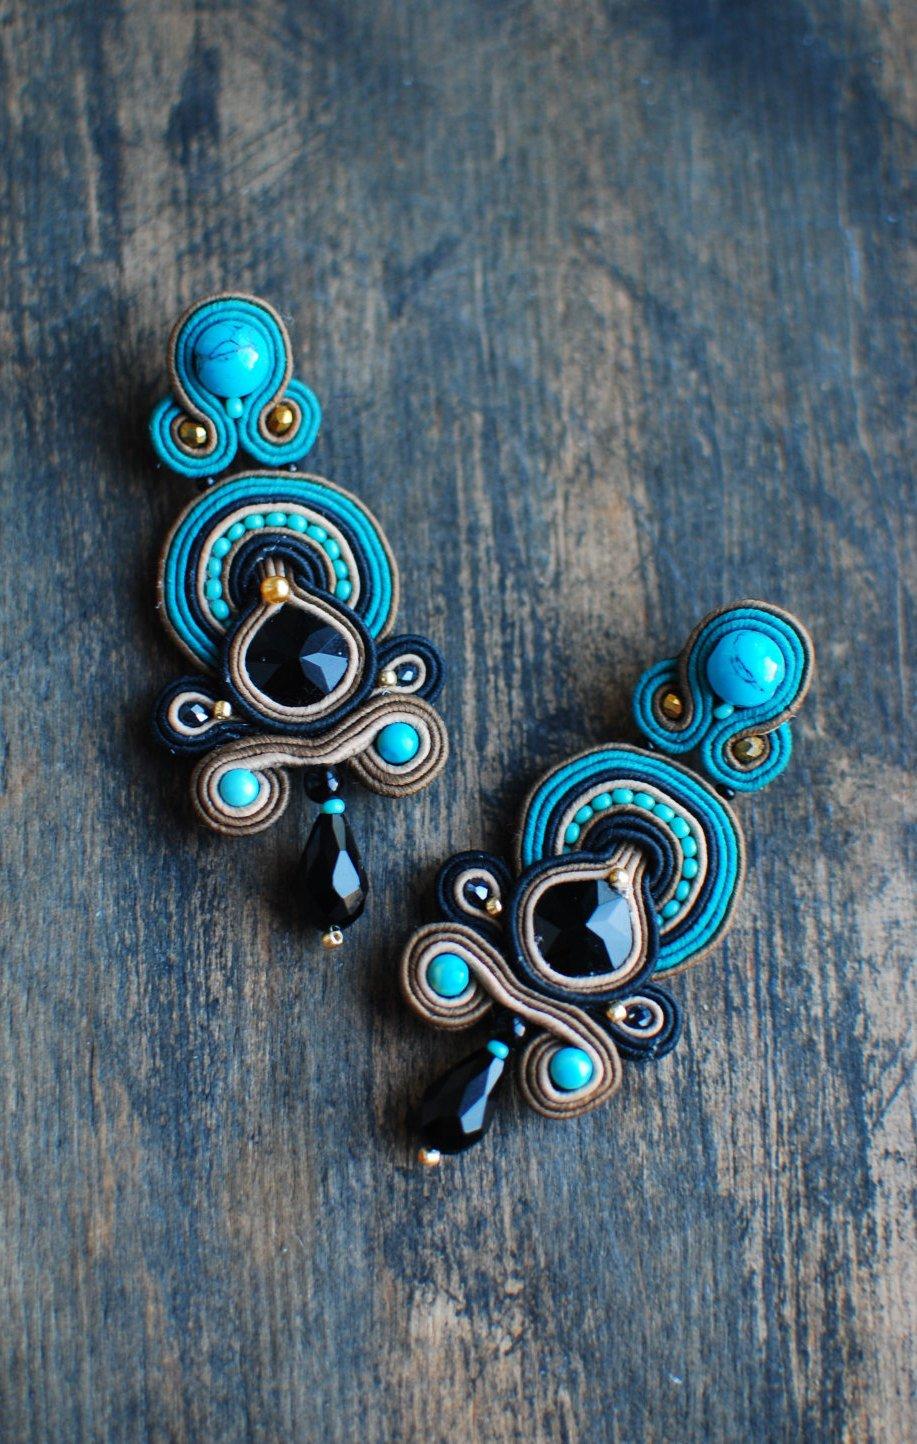 Soutache dangle earrings, Black, beige and turquoise earrings, Embroidered earrings, Beaded earrings